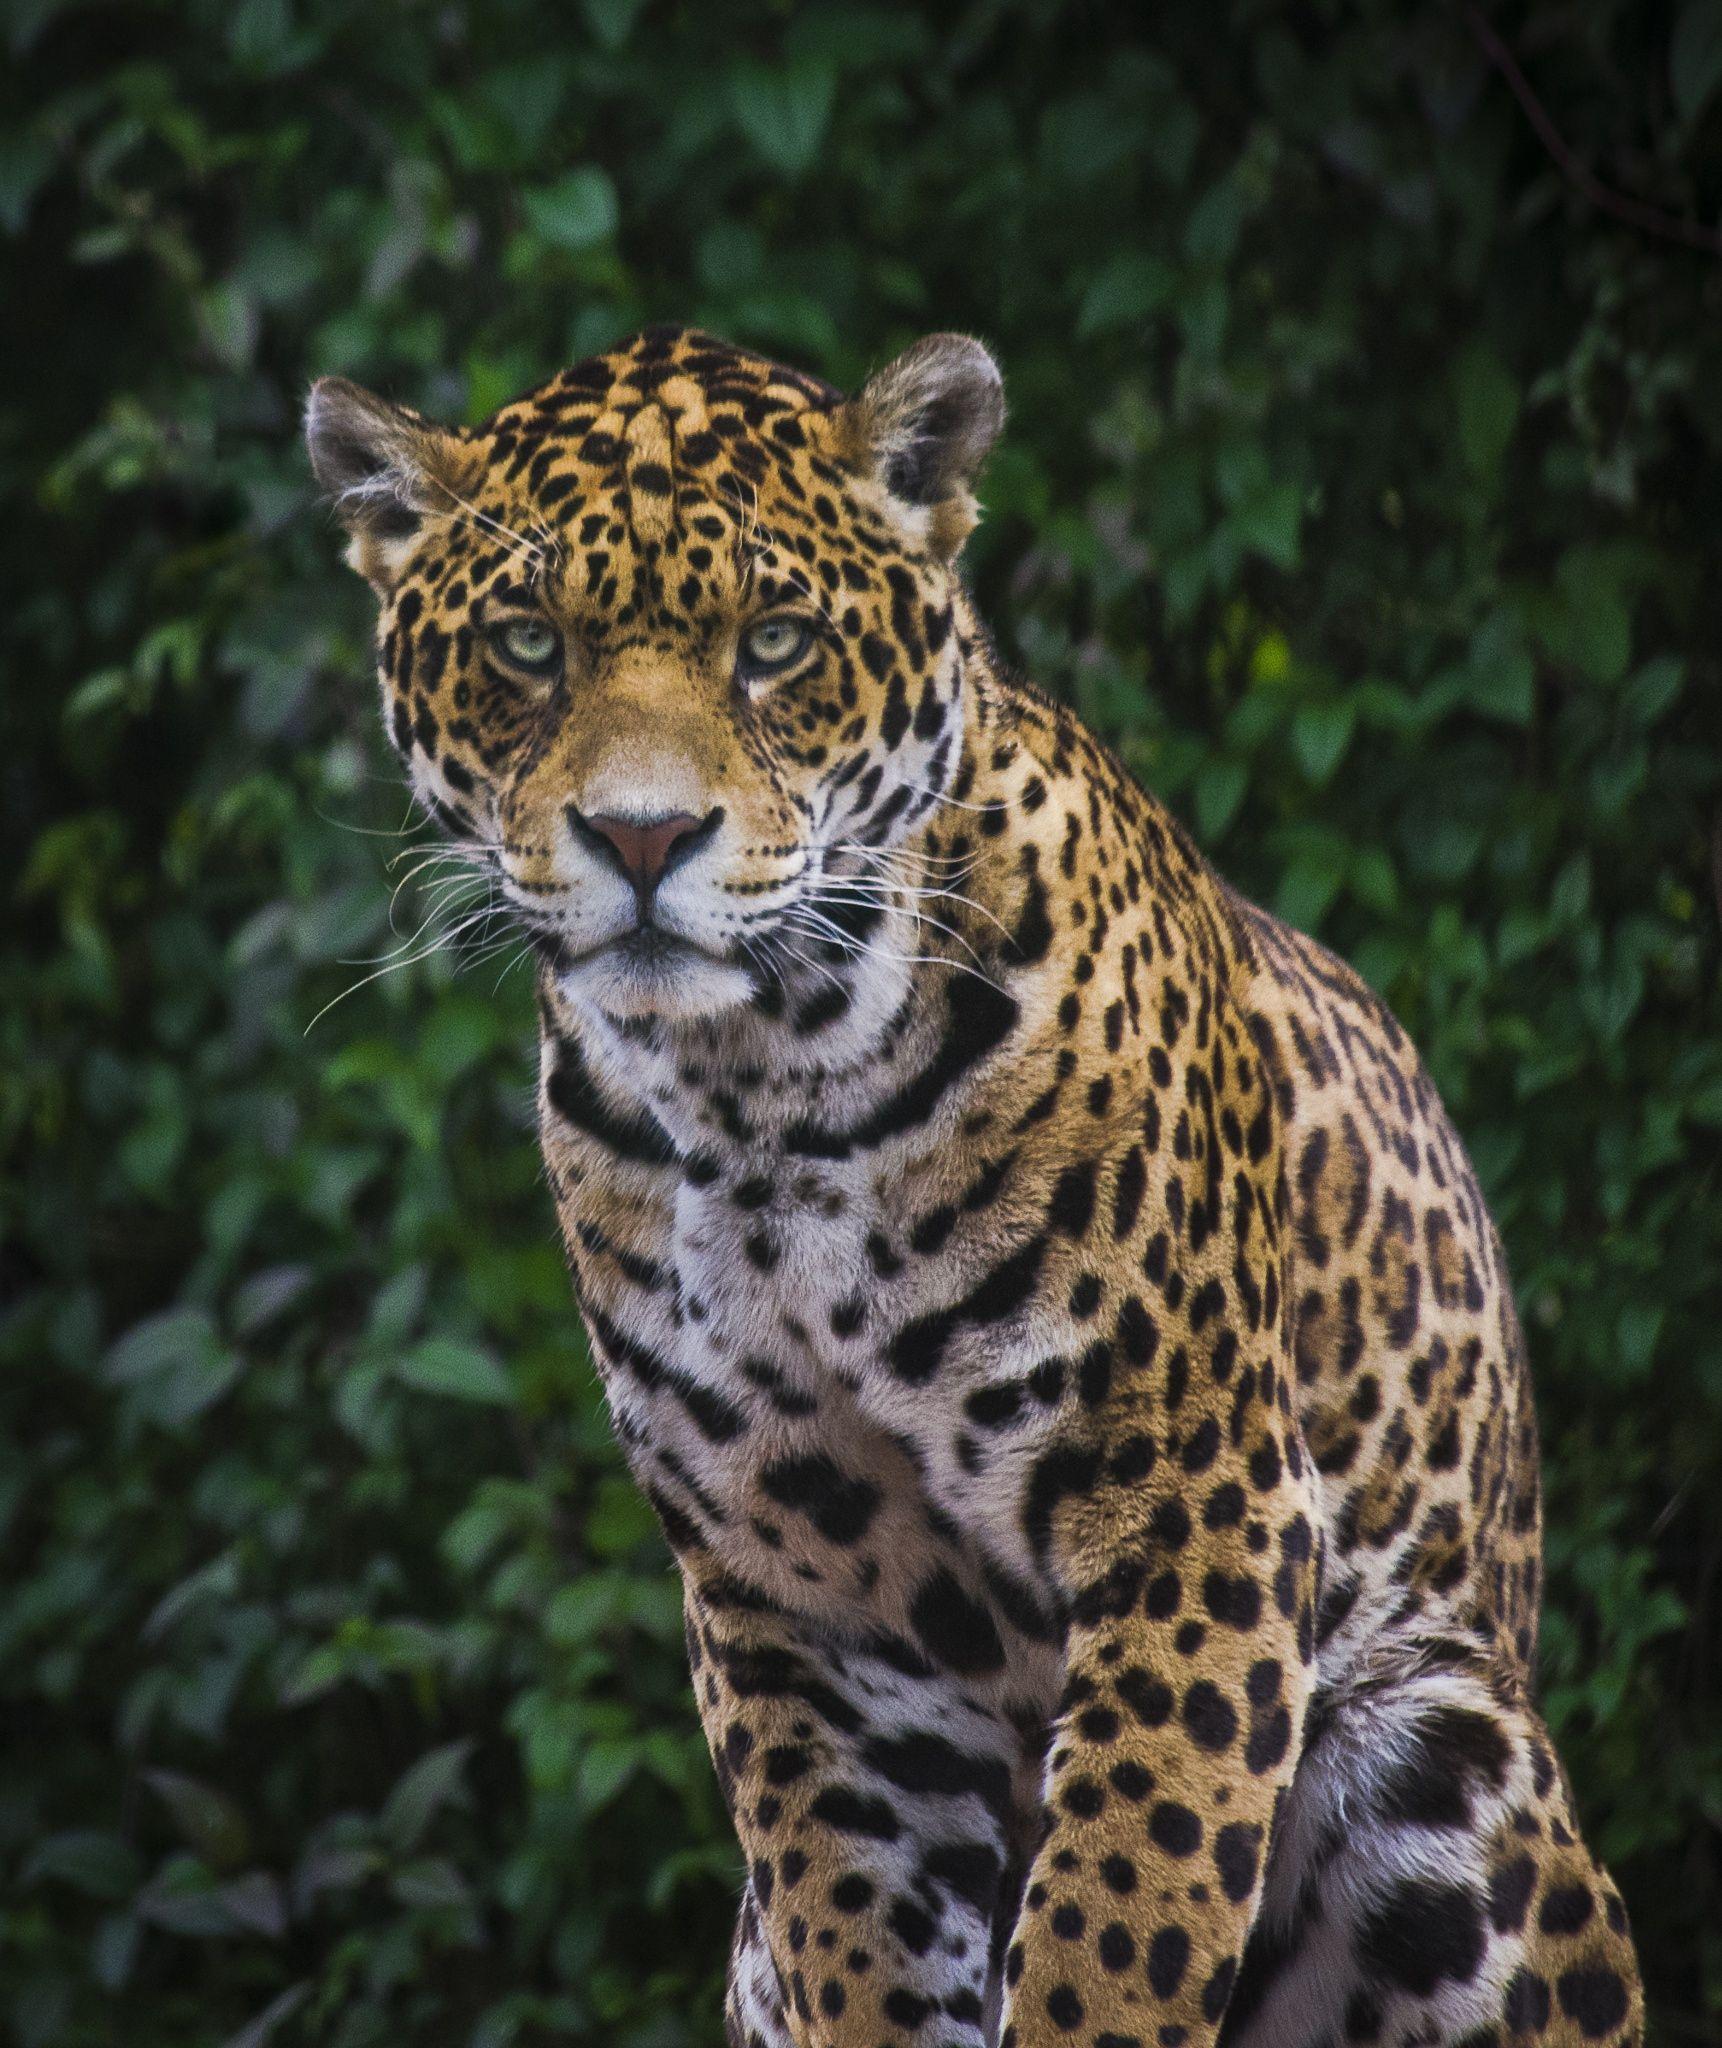 Jaguar Roar: Jaguar ~ Count My Spots! ... Giggle